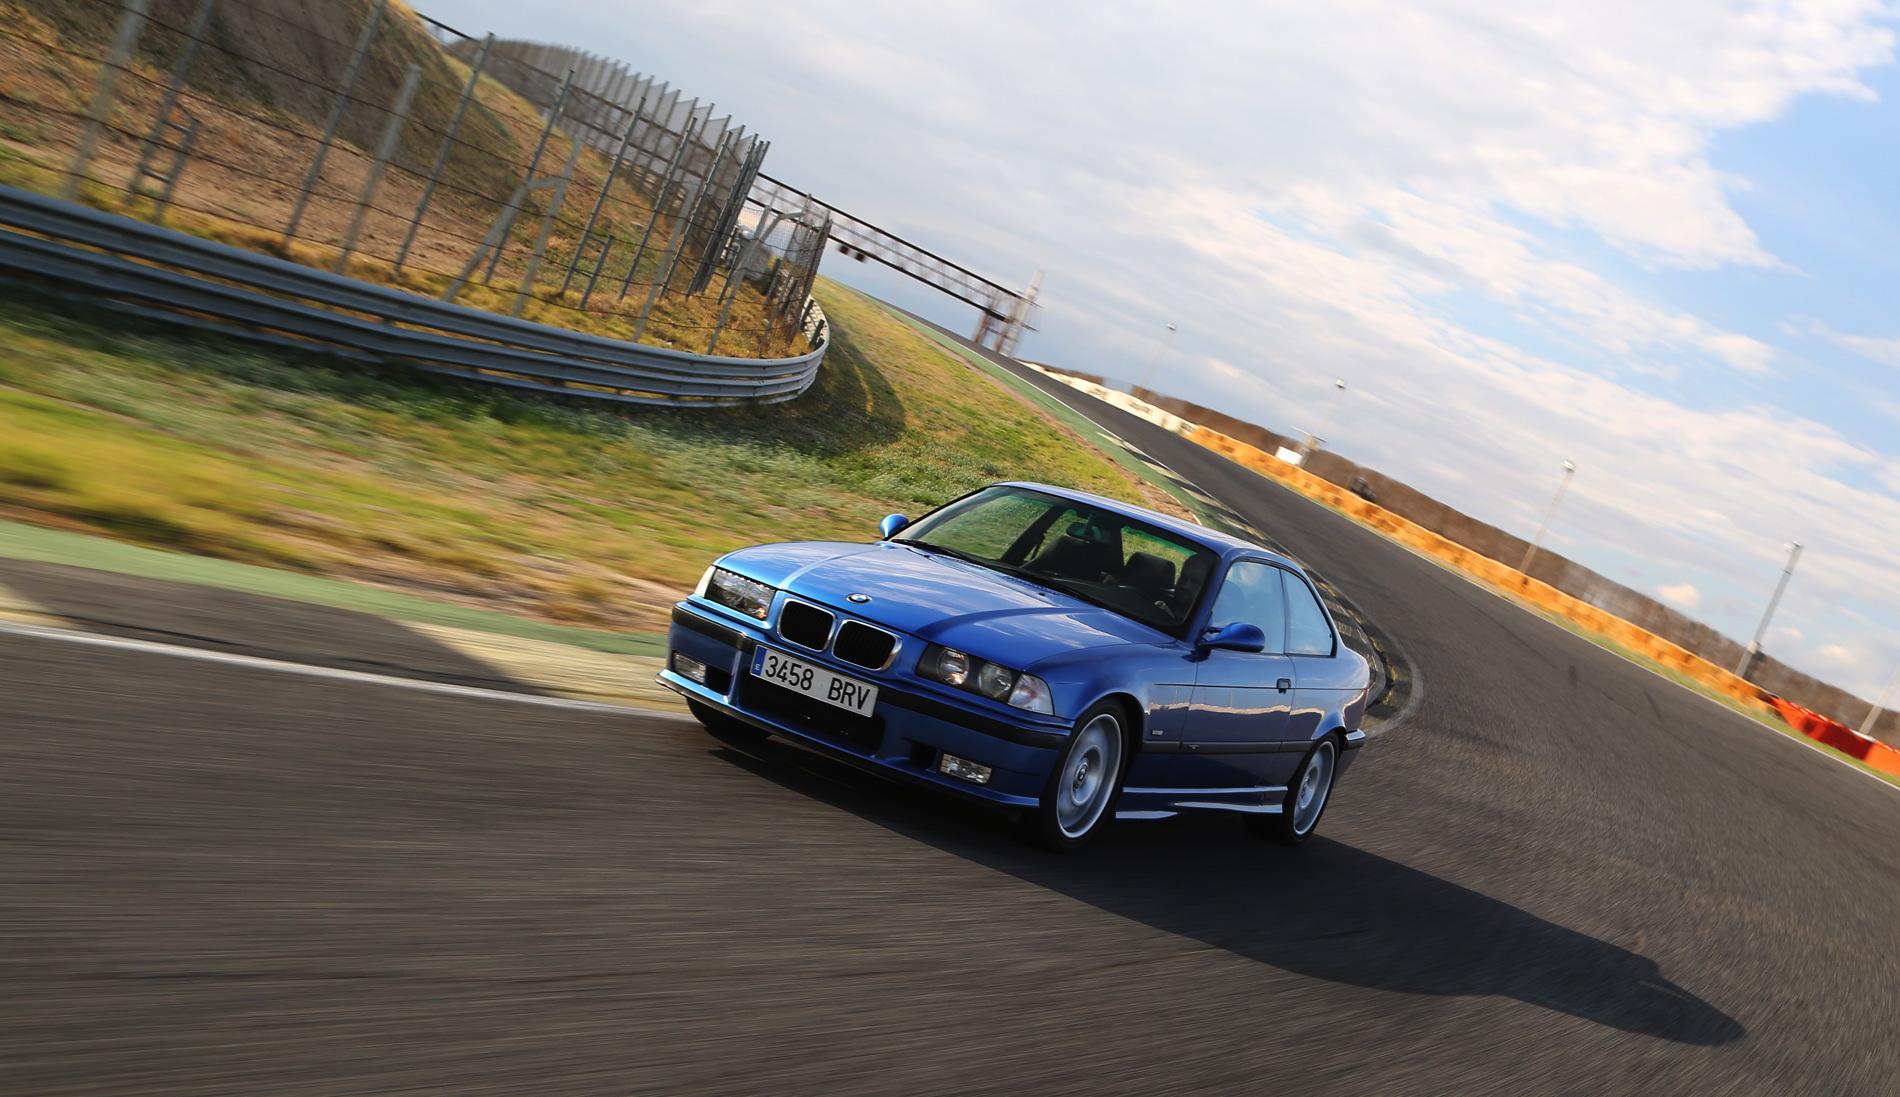 E36 BMW M3 race track 6